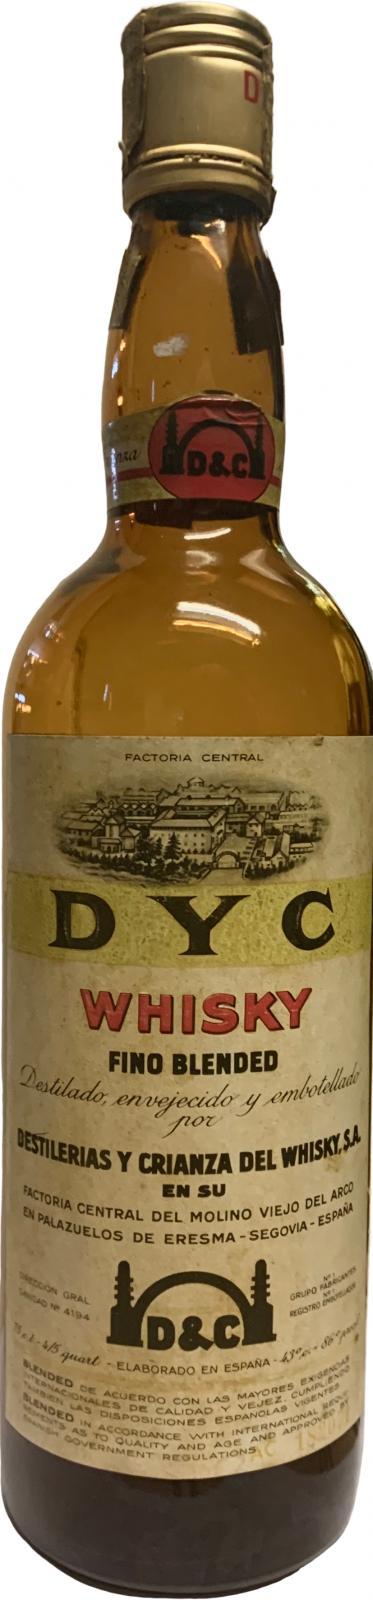 DYC Fino Blended